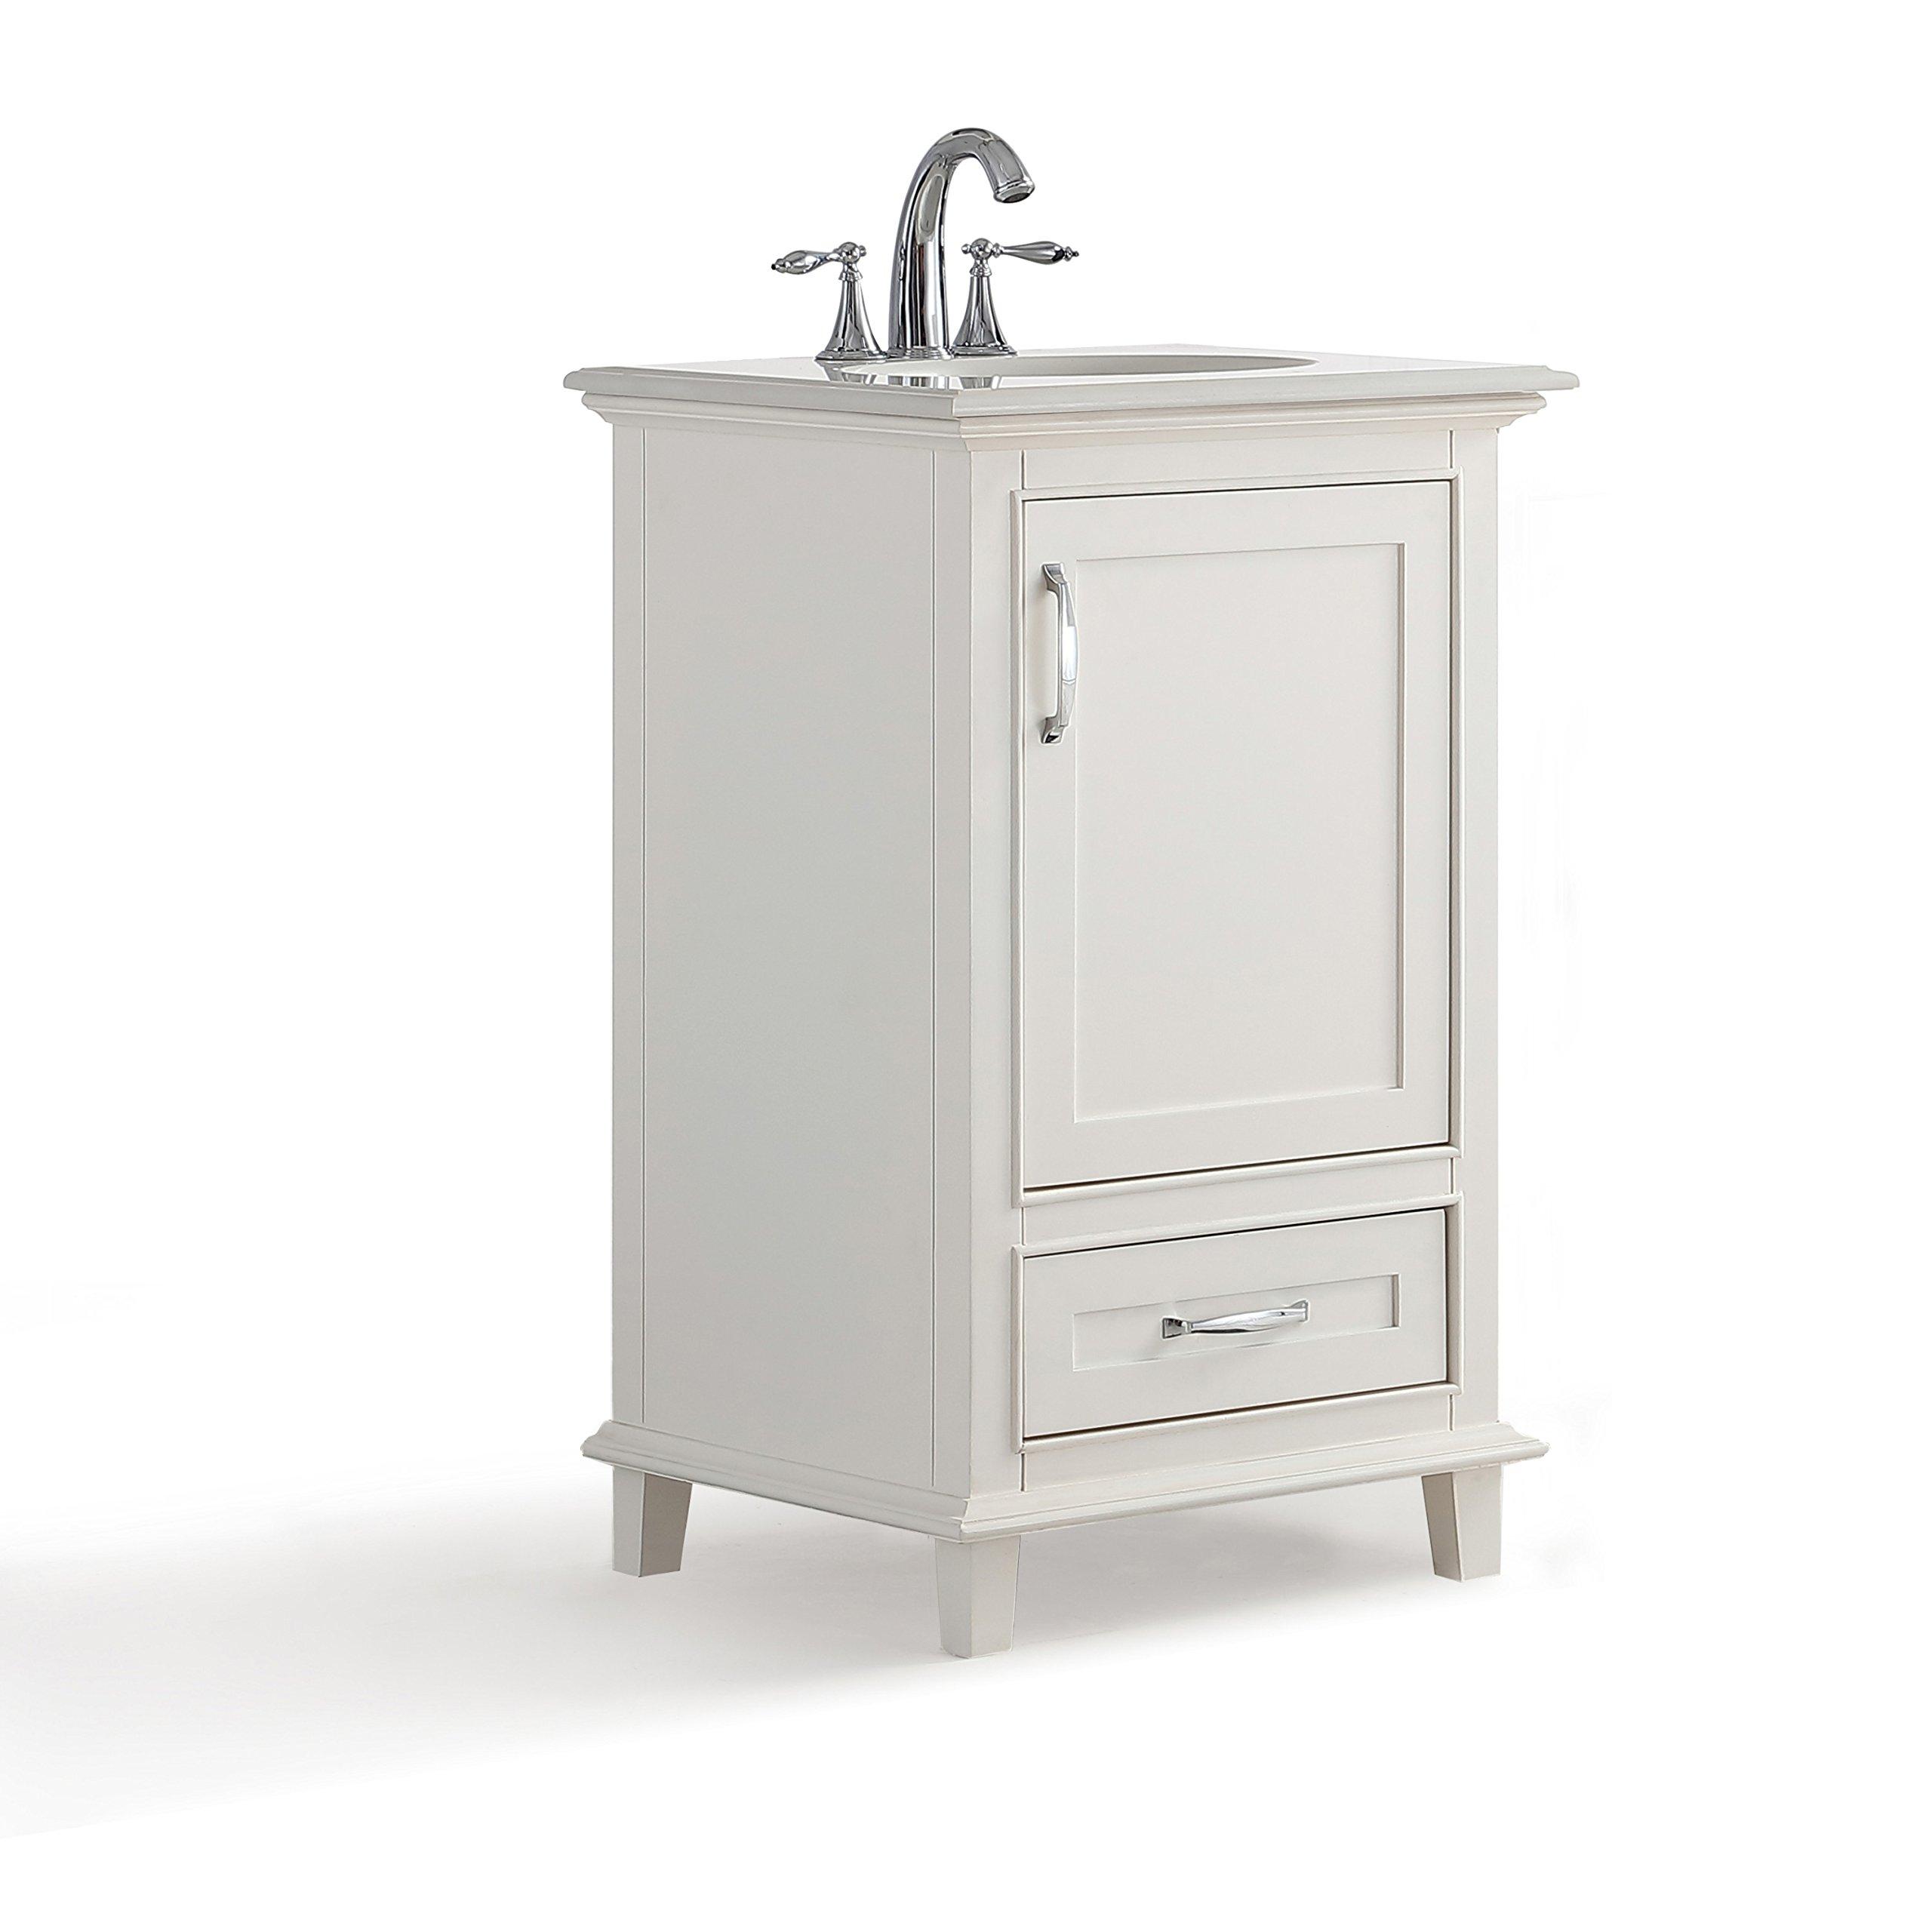 Simpli Home Ariana 20 inch Bath Vanity with Bombay White Quartz Marble Top Soft White